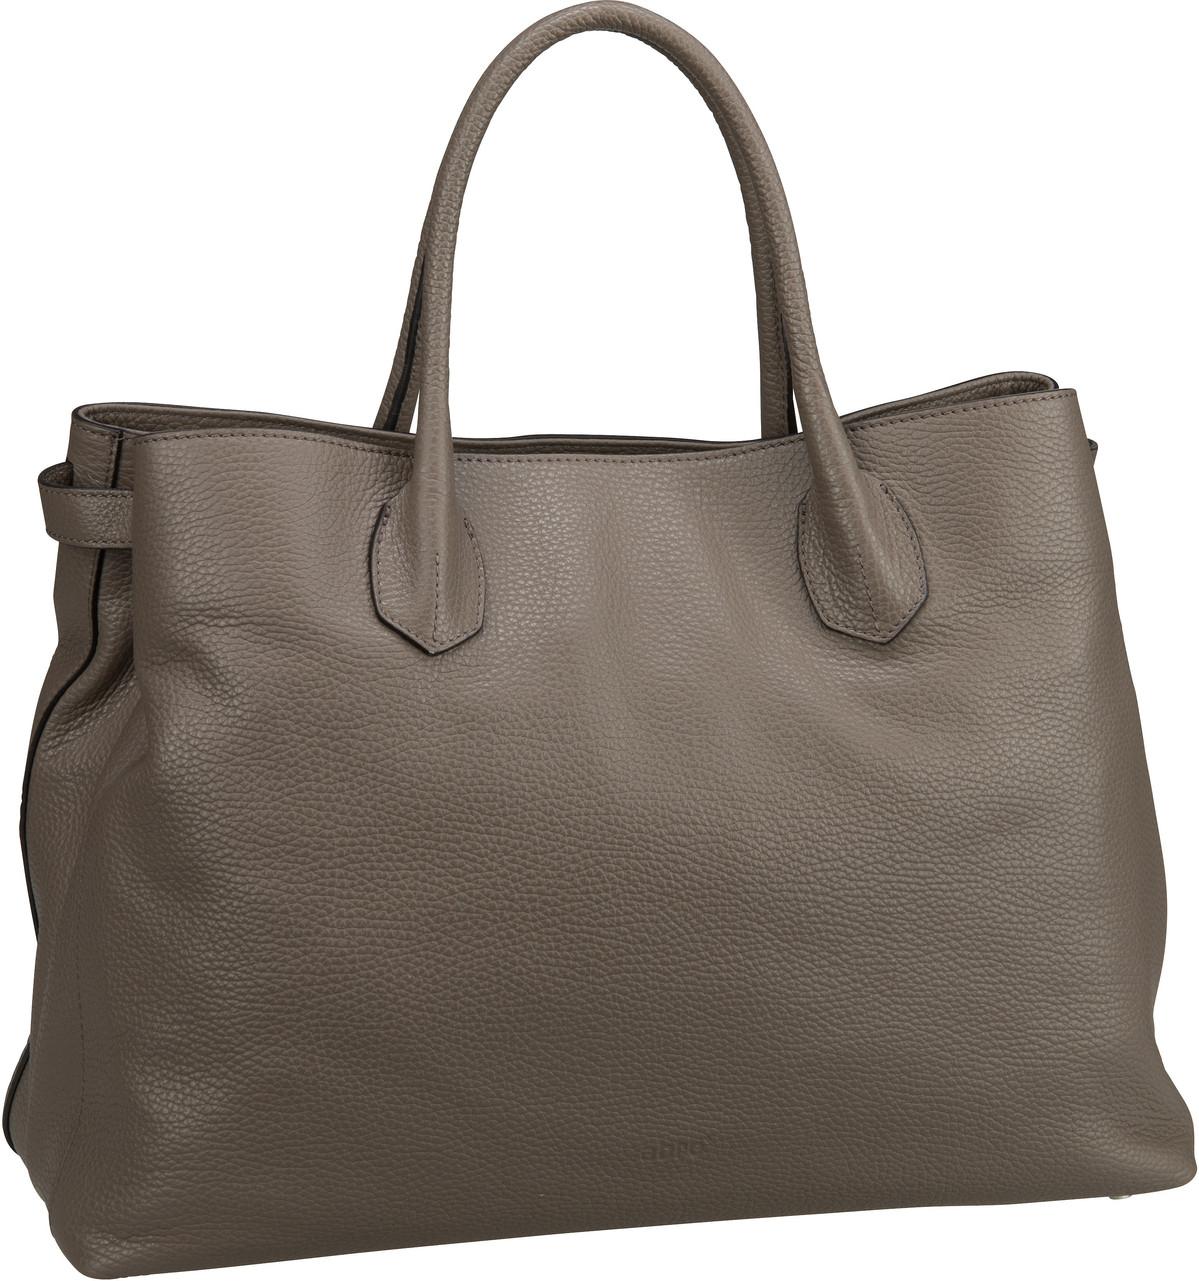 Handtasche Calf Adria 28602 Taupe